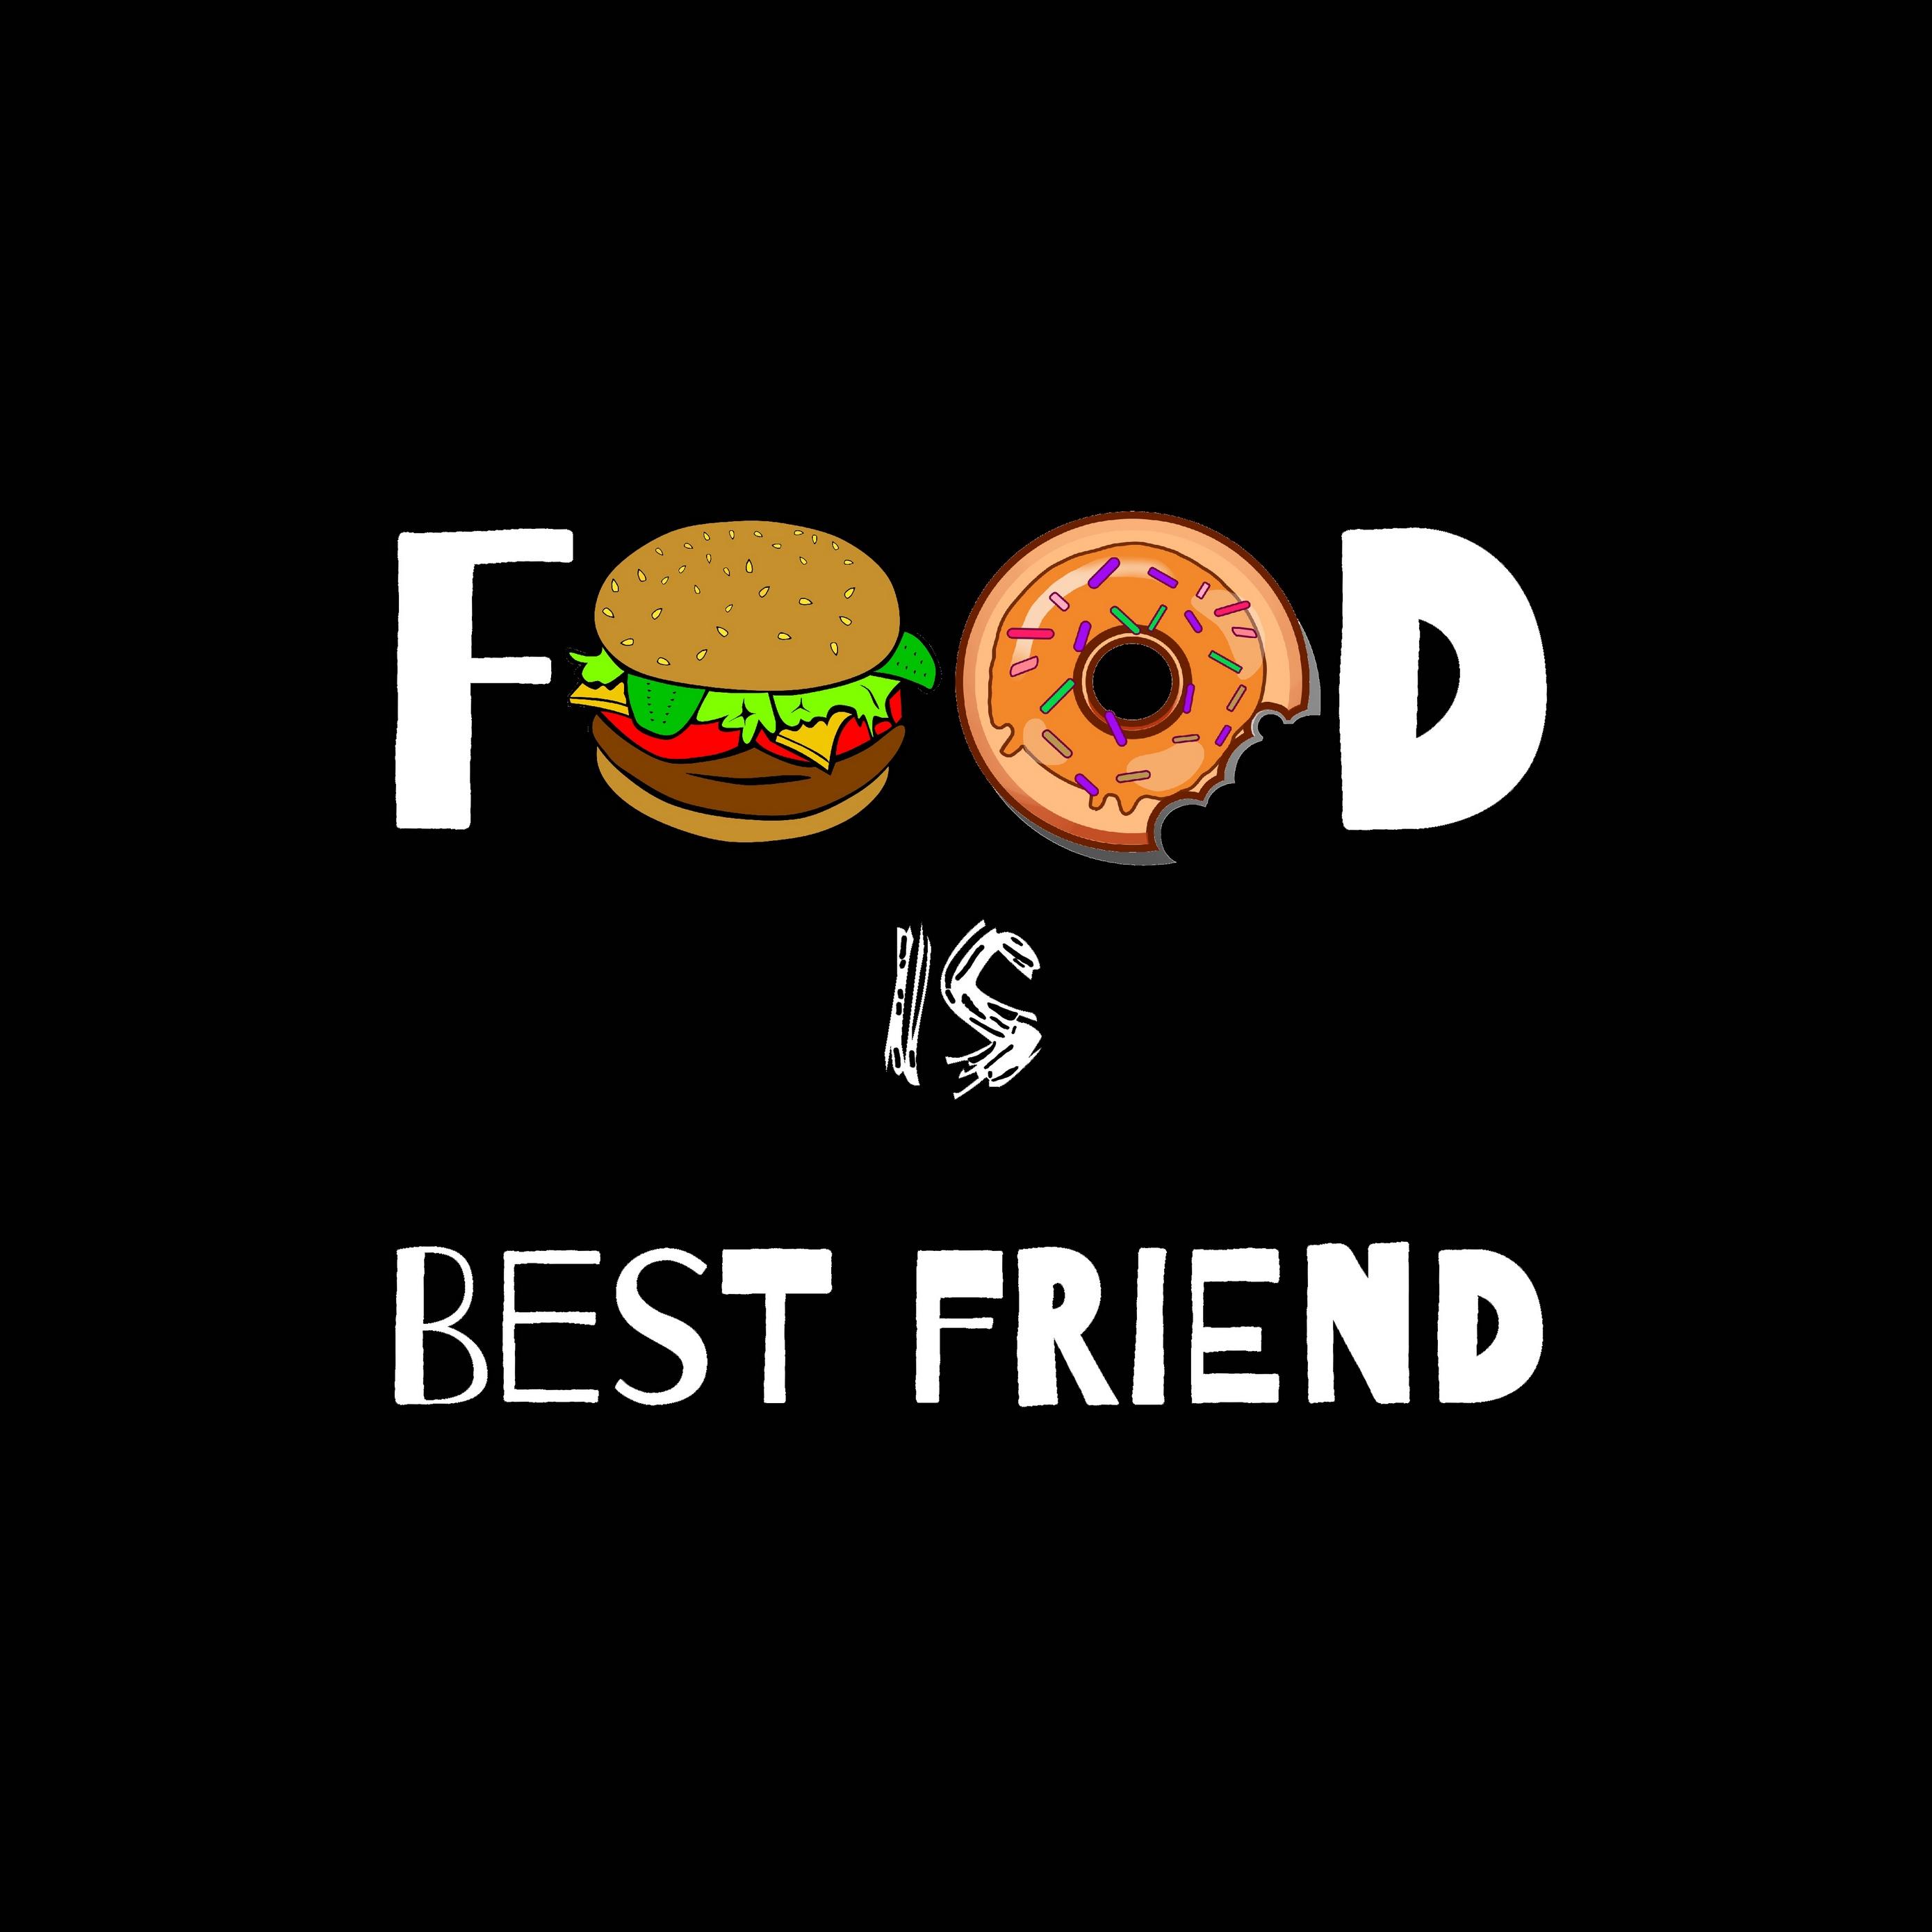 Download wallpaper 2780x2780 food love real love inscription 2780x2780